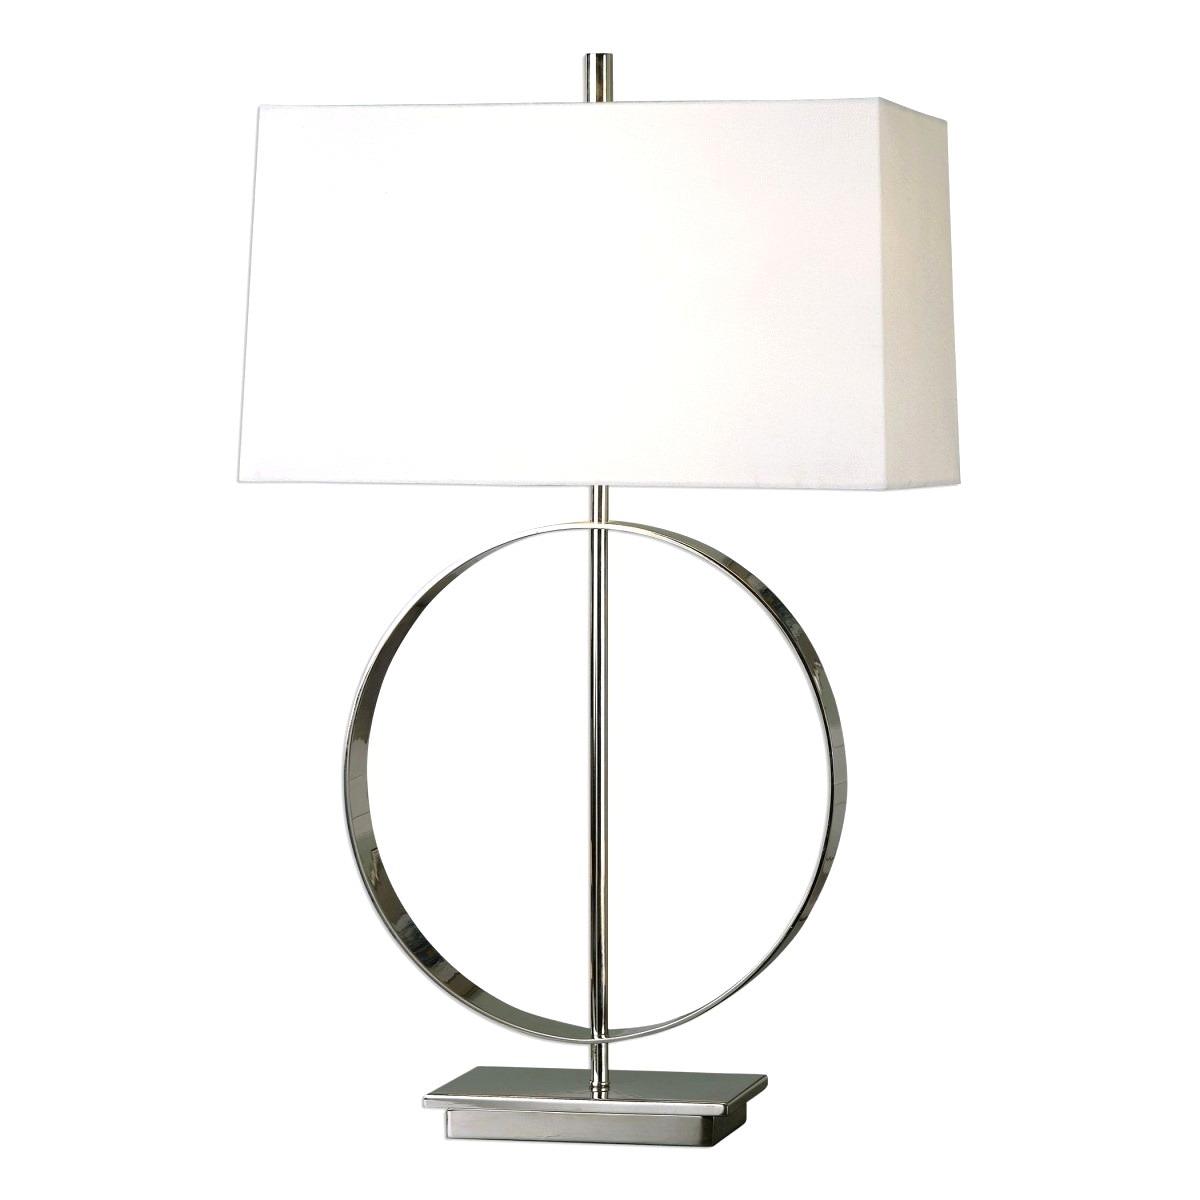 Floor Globe with Stand Cool Floor Standing Lamp Metalorgtfo Com Metalorgtfo Com